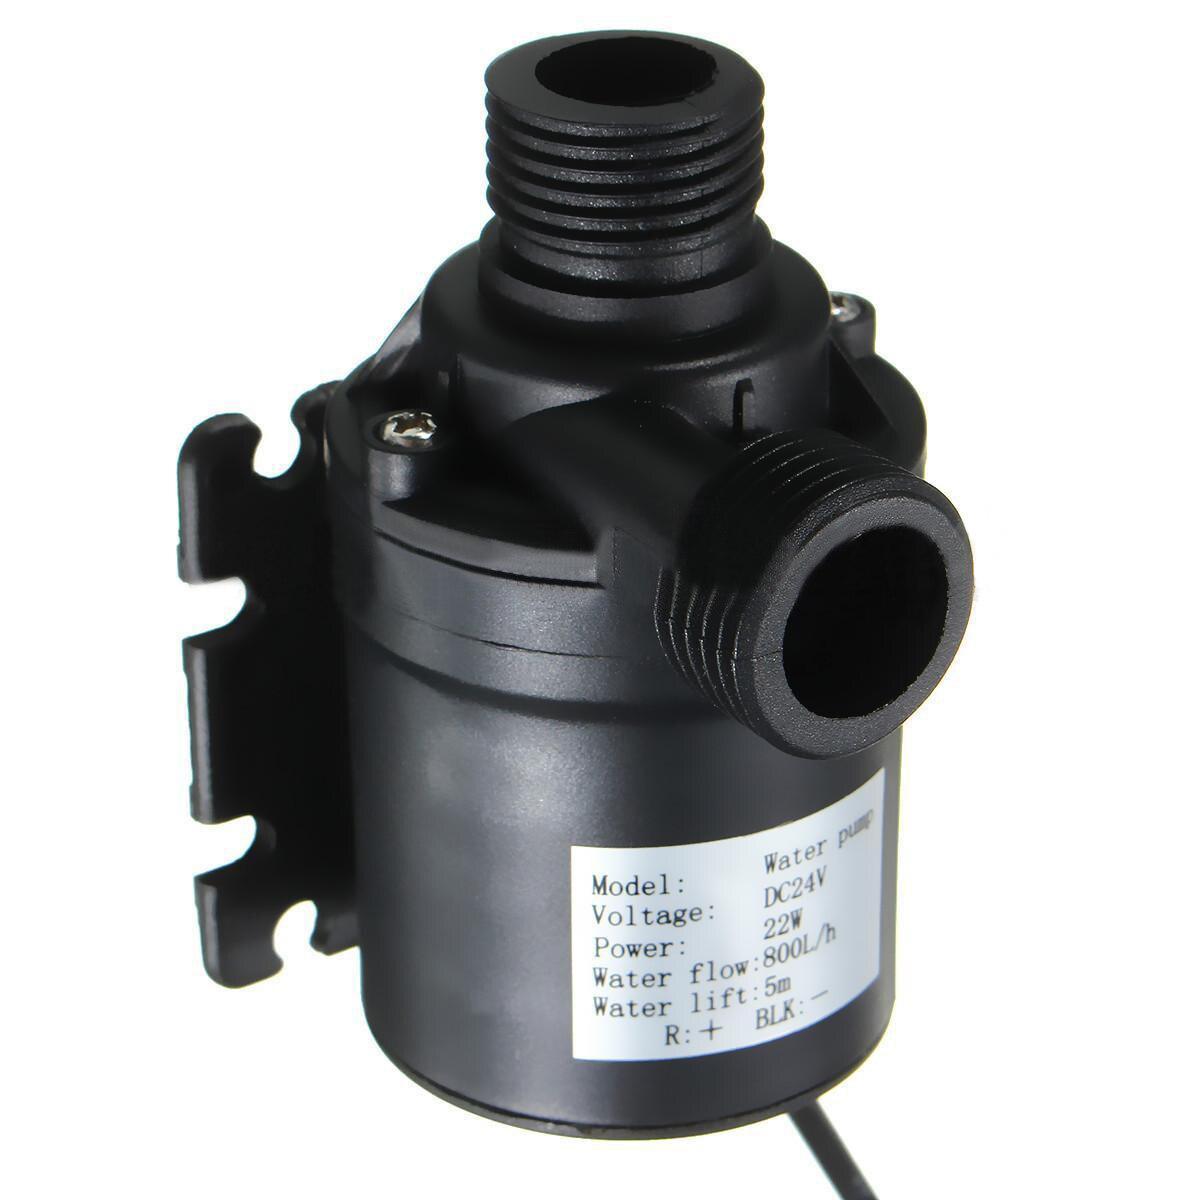 1pc Mini Brushless Water Pump 12V 24V ZYW680 Solar Water Circulation Pump DC Motor 800L/H